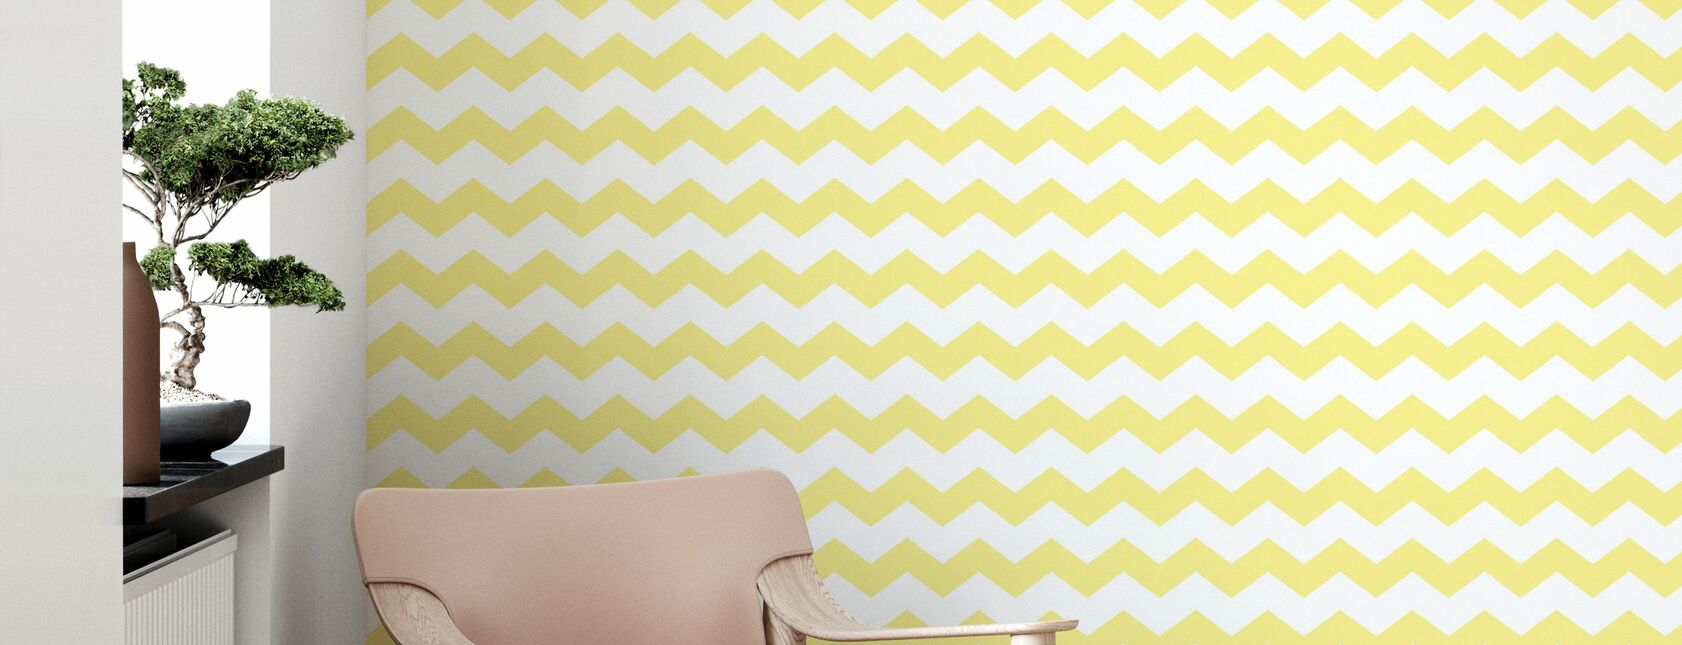 Zickzack - Yellow - Wallpaper - Living Room